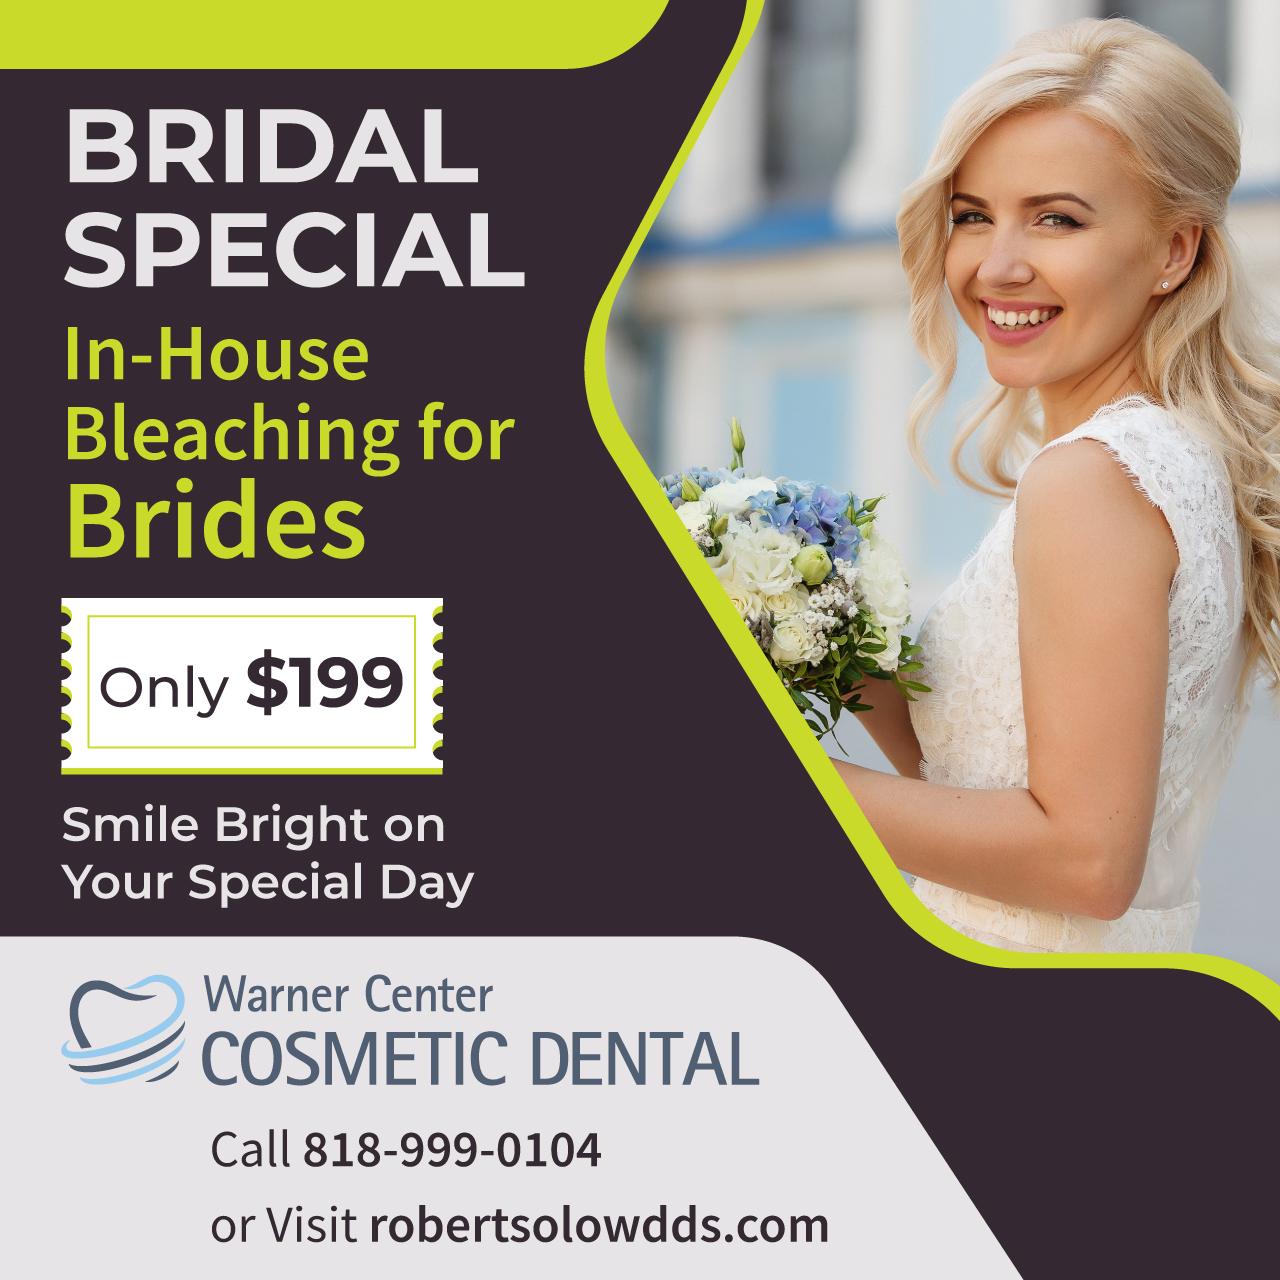 Bridal Special Offer